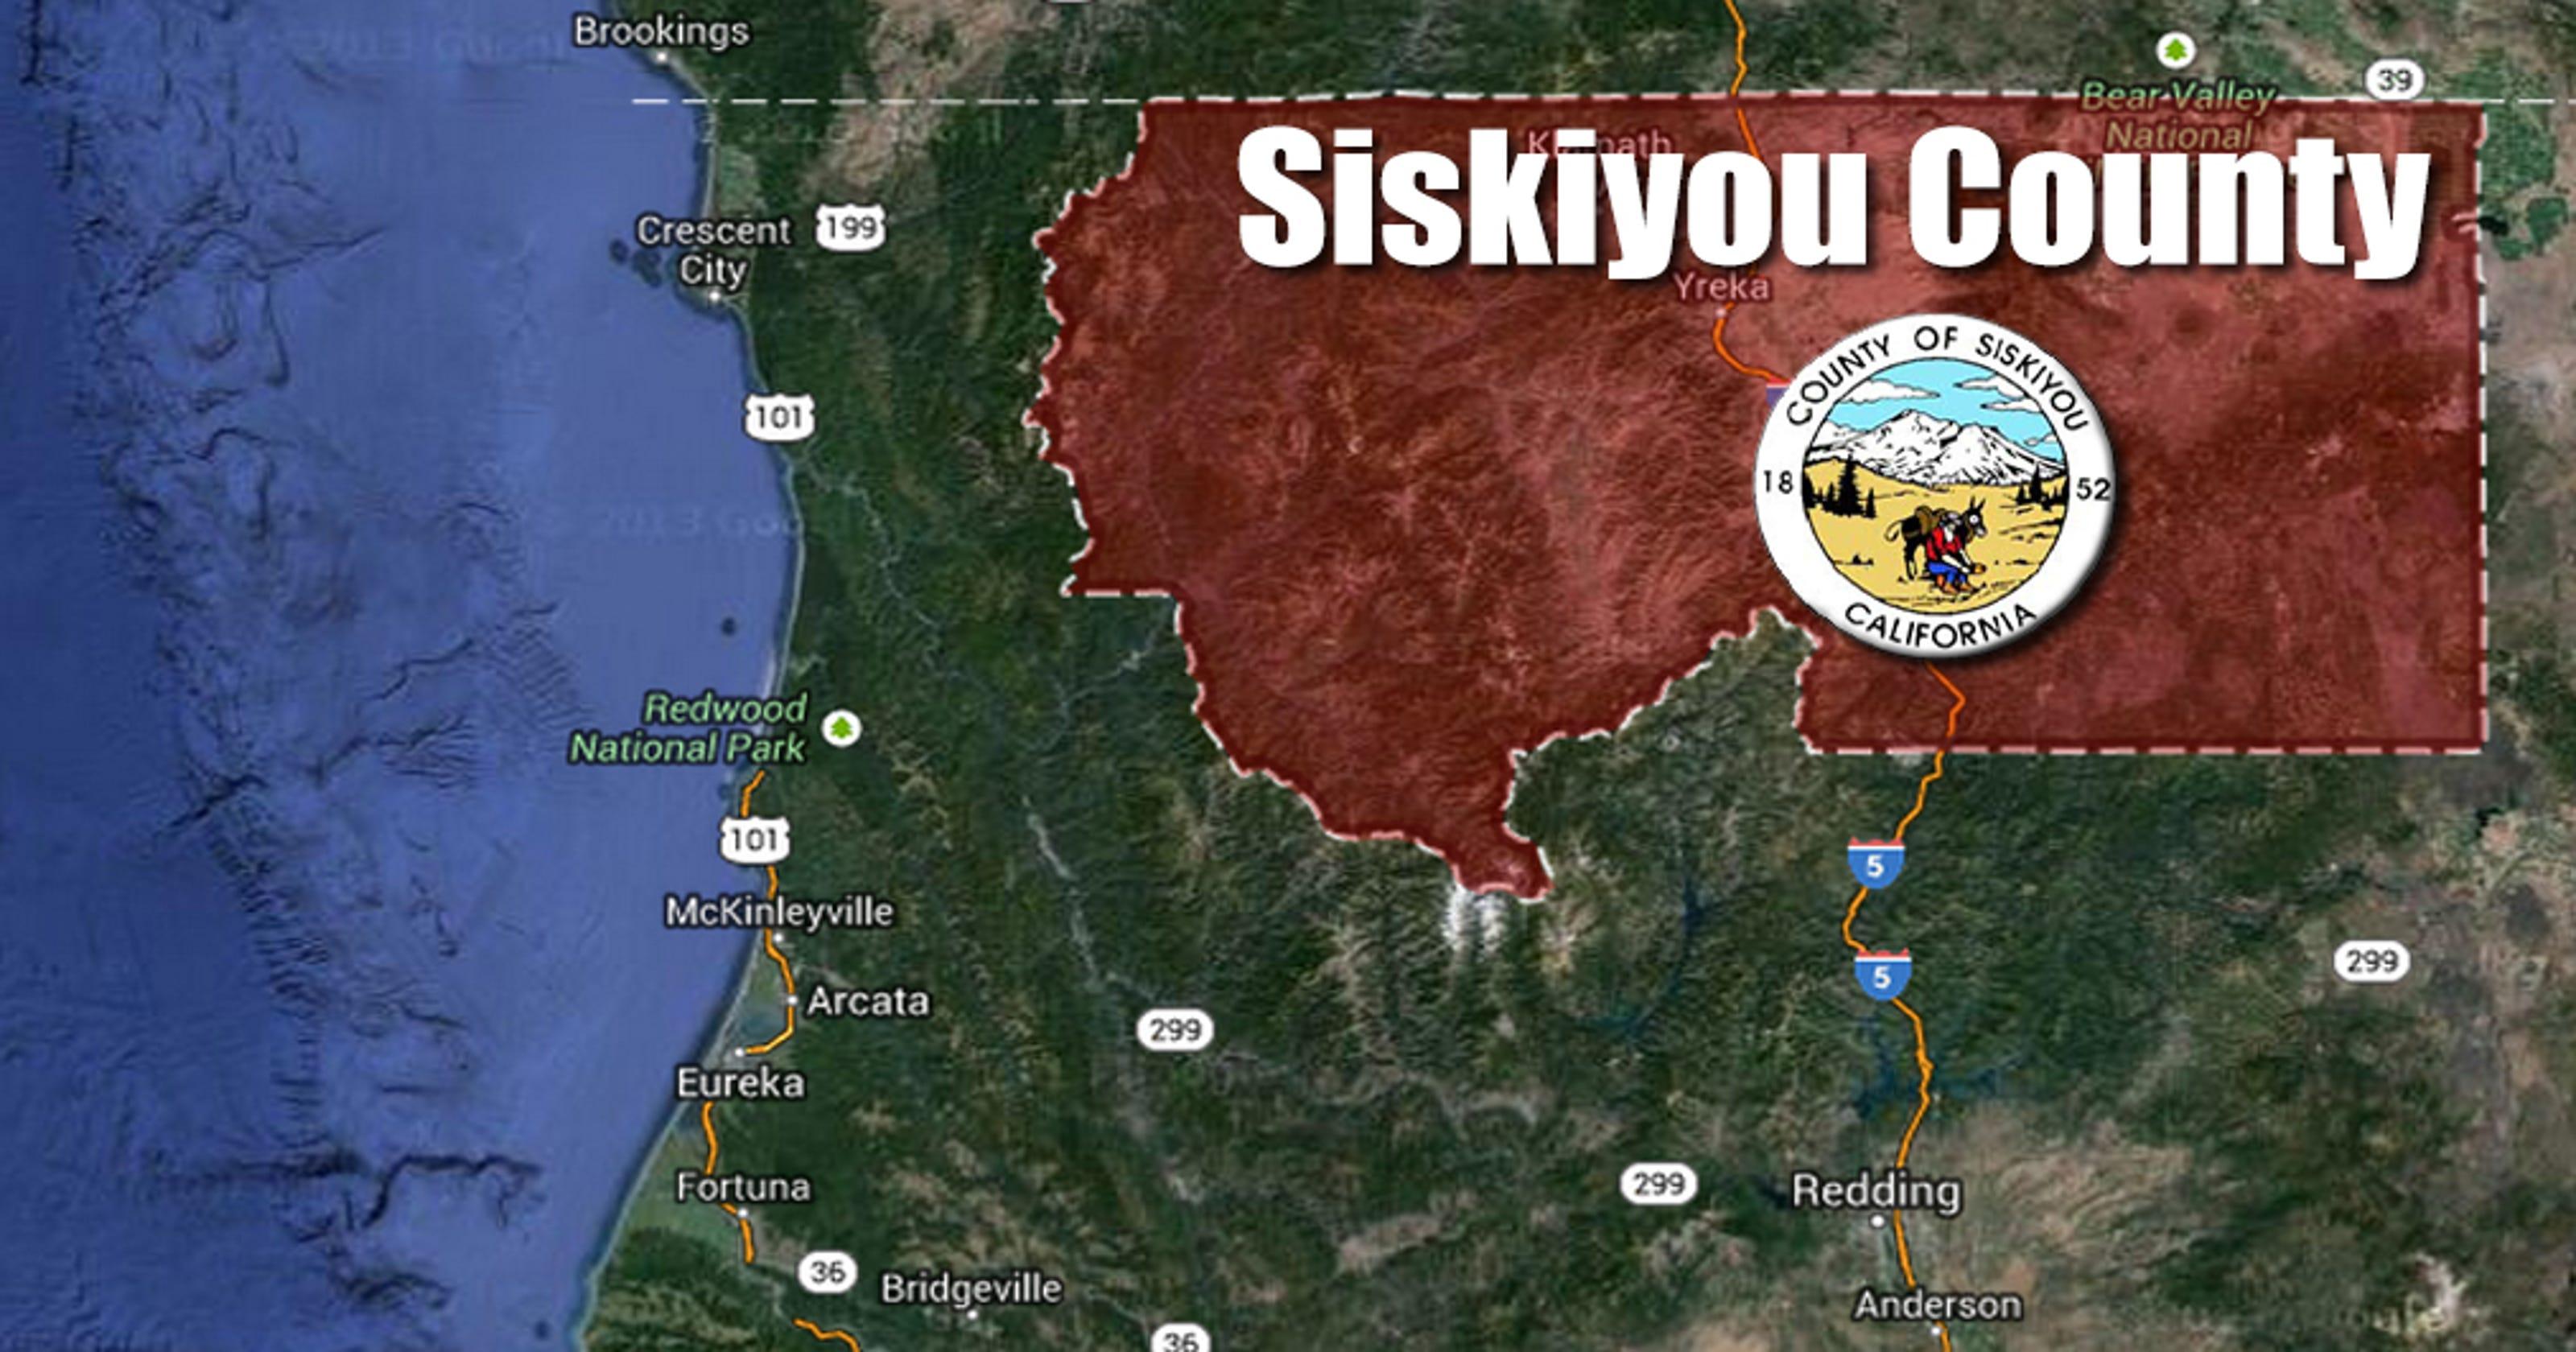 Tribes Oppose Restoring New Siskiyou County Rancheria